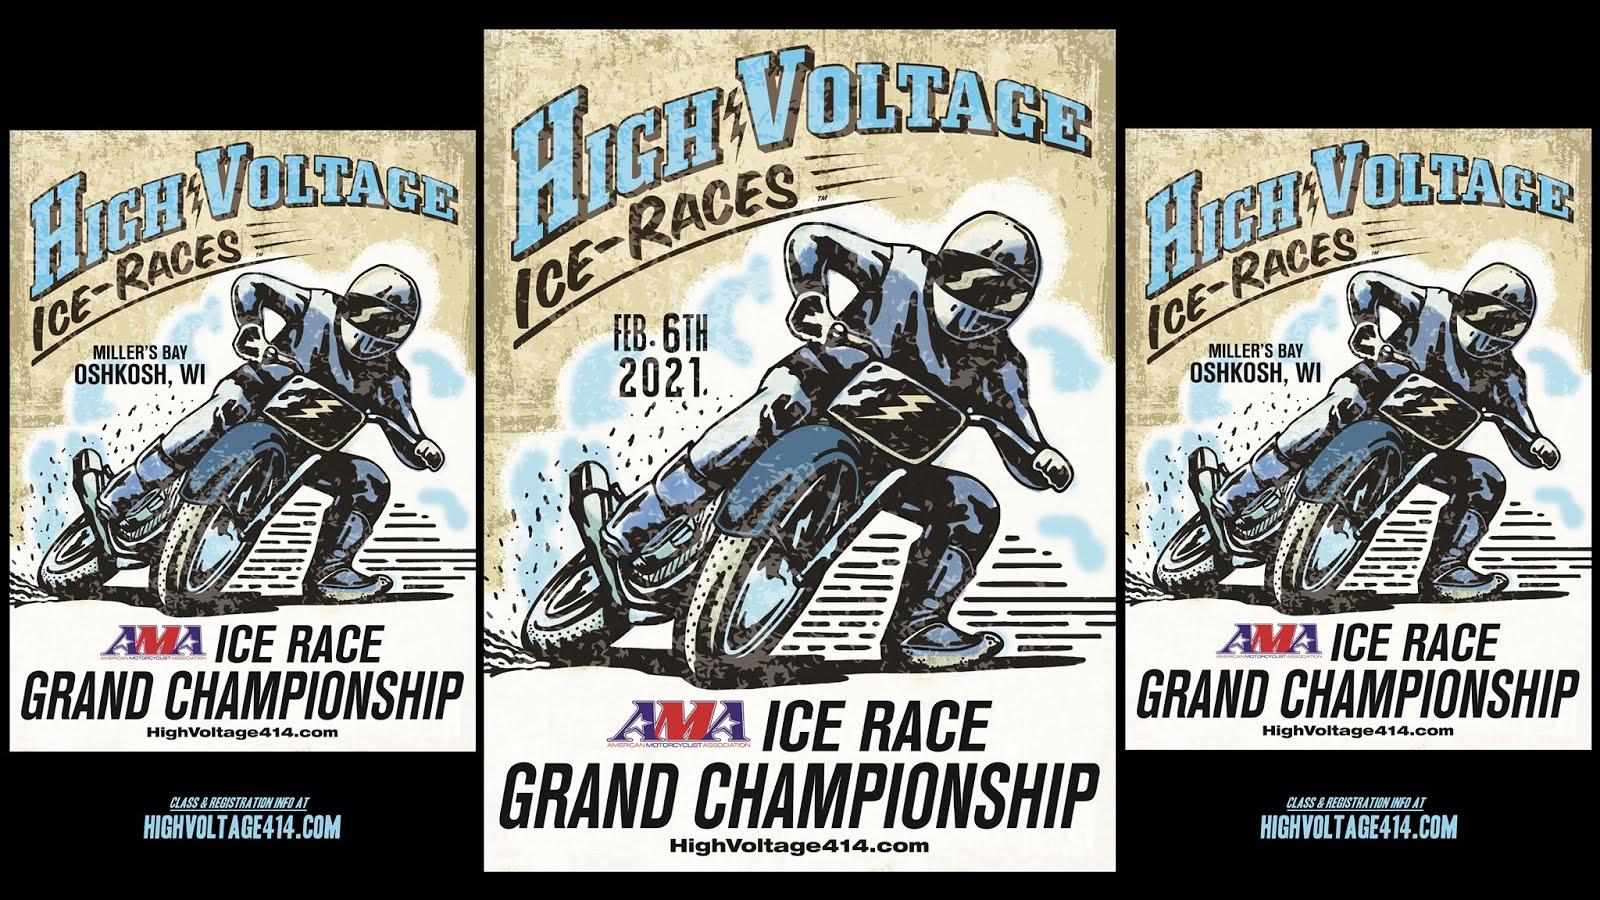 High Voltage Ice races